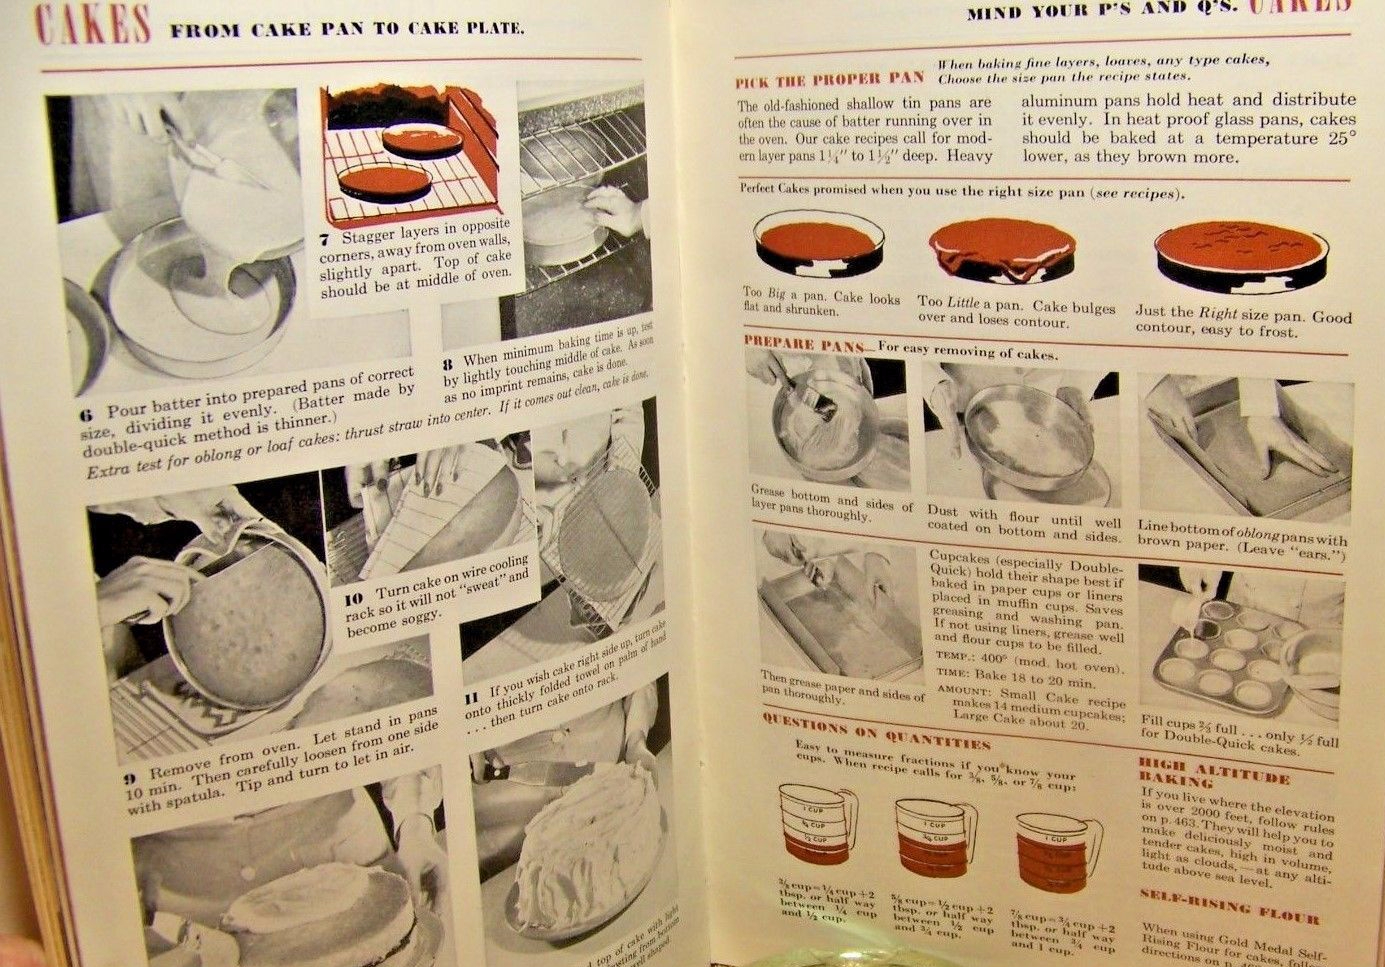 betty-crocker-picture-cookbook.jpg